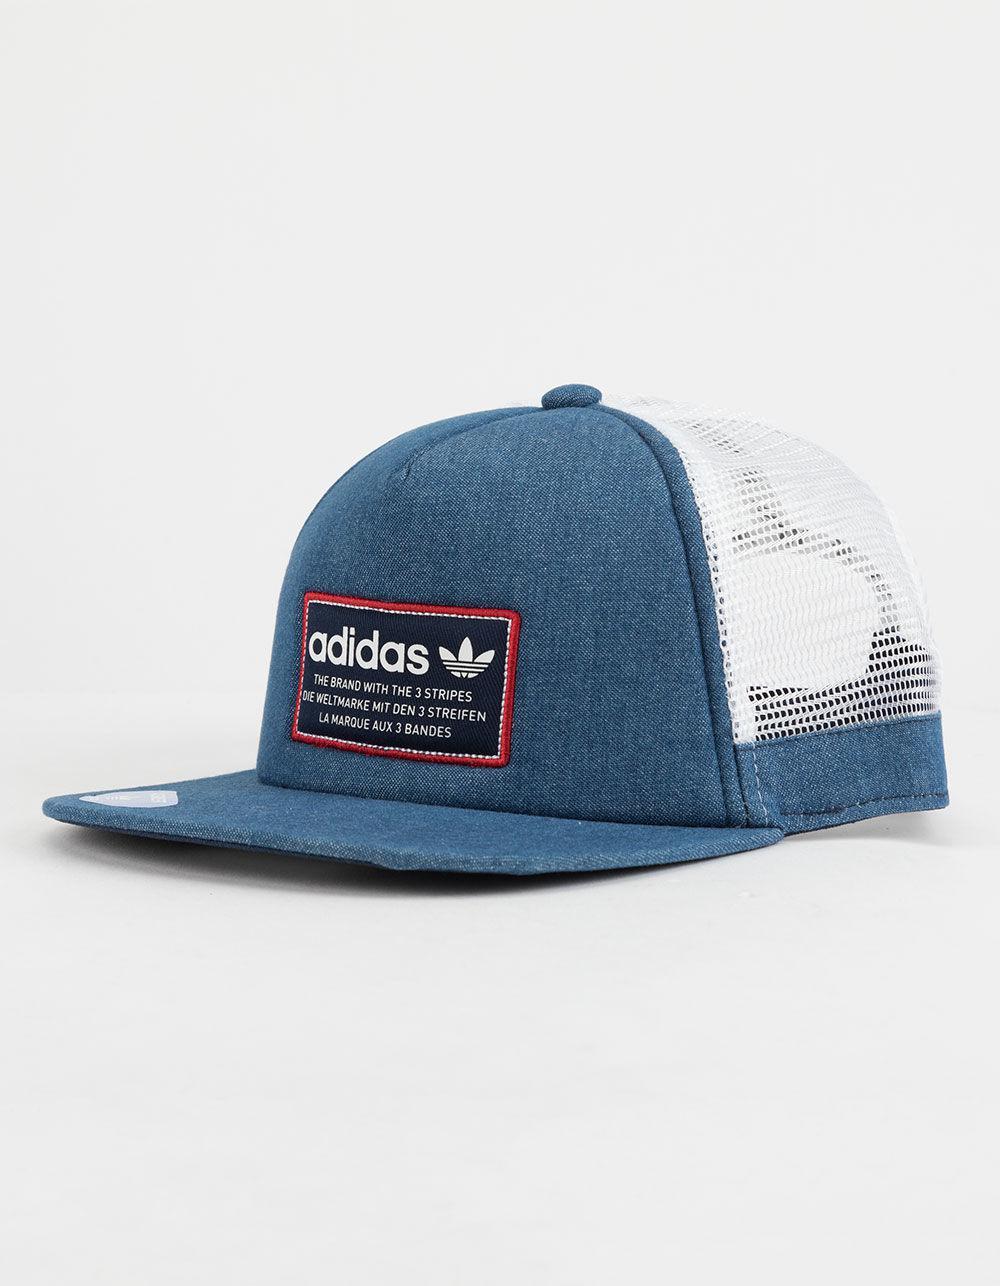 5ab28126863 Lyst - adidas Originals Patch Mens Trucker Hat in Blue for Men